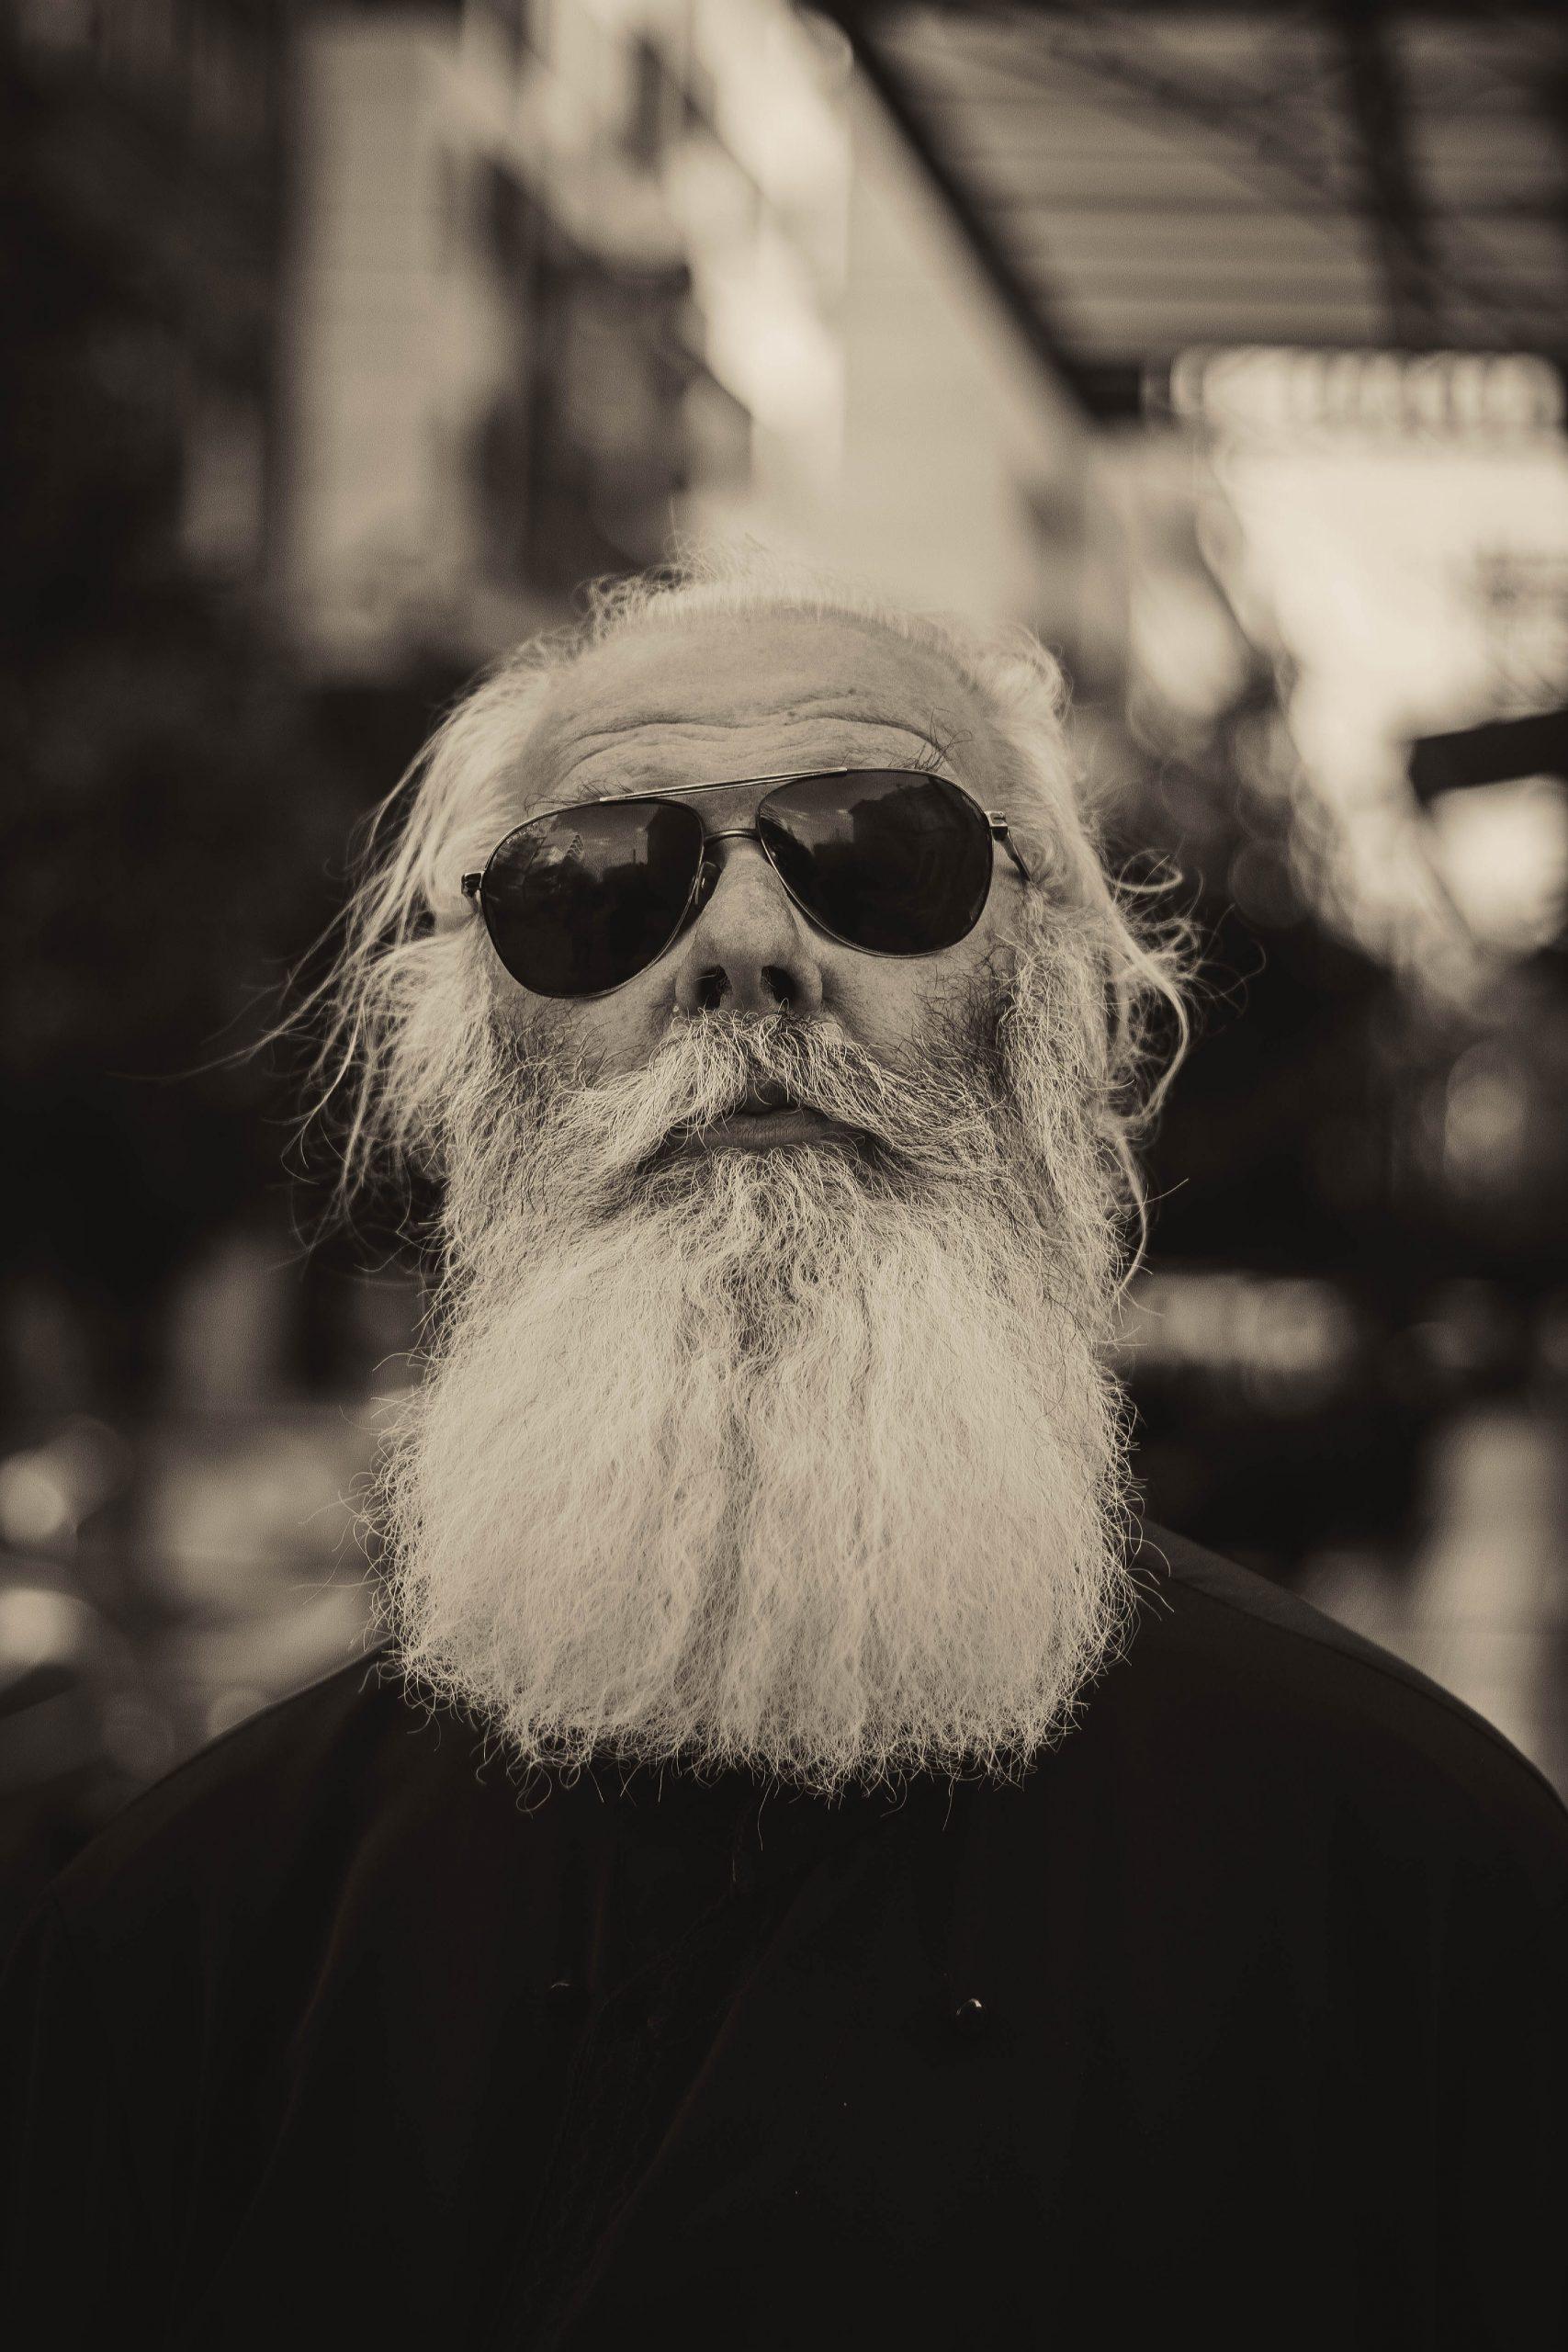 The Greek Elder, Photo: Bearded Man, Monochrome, Eyeglass-Chinedum Odunze